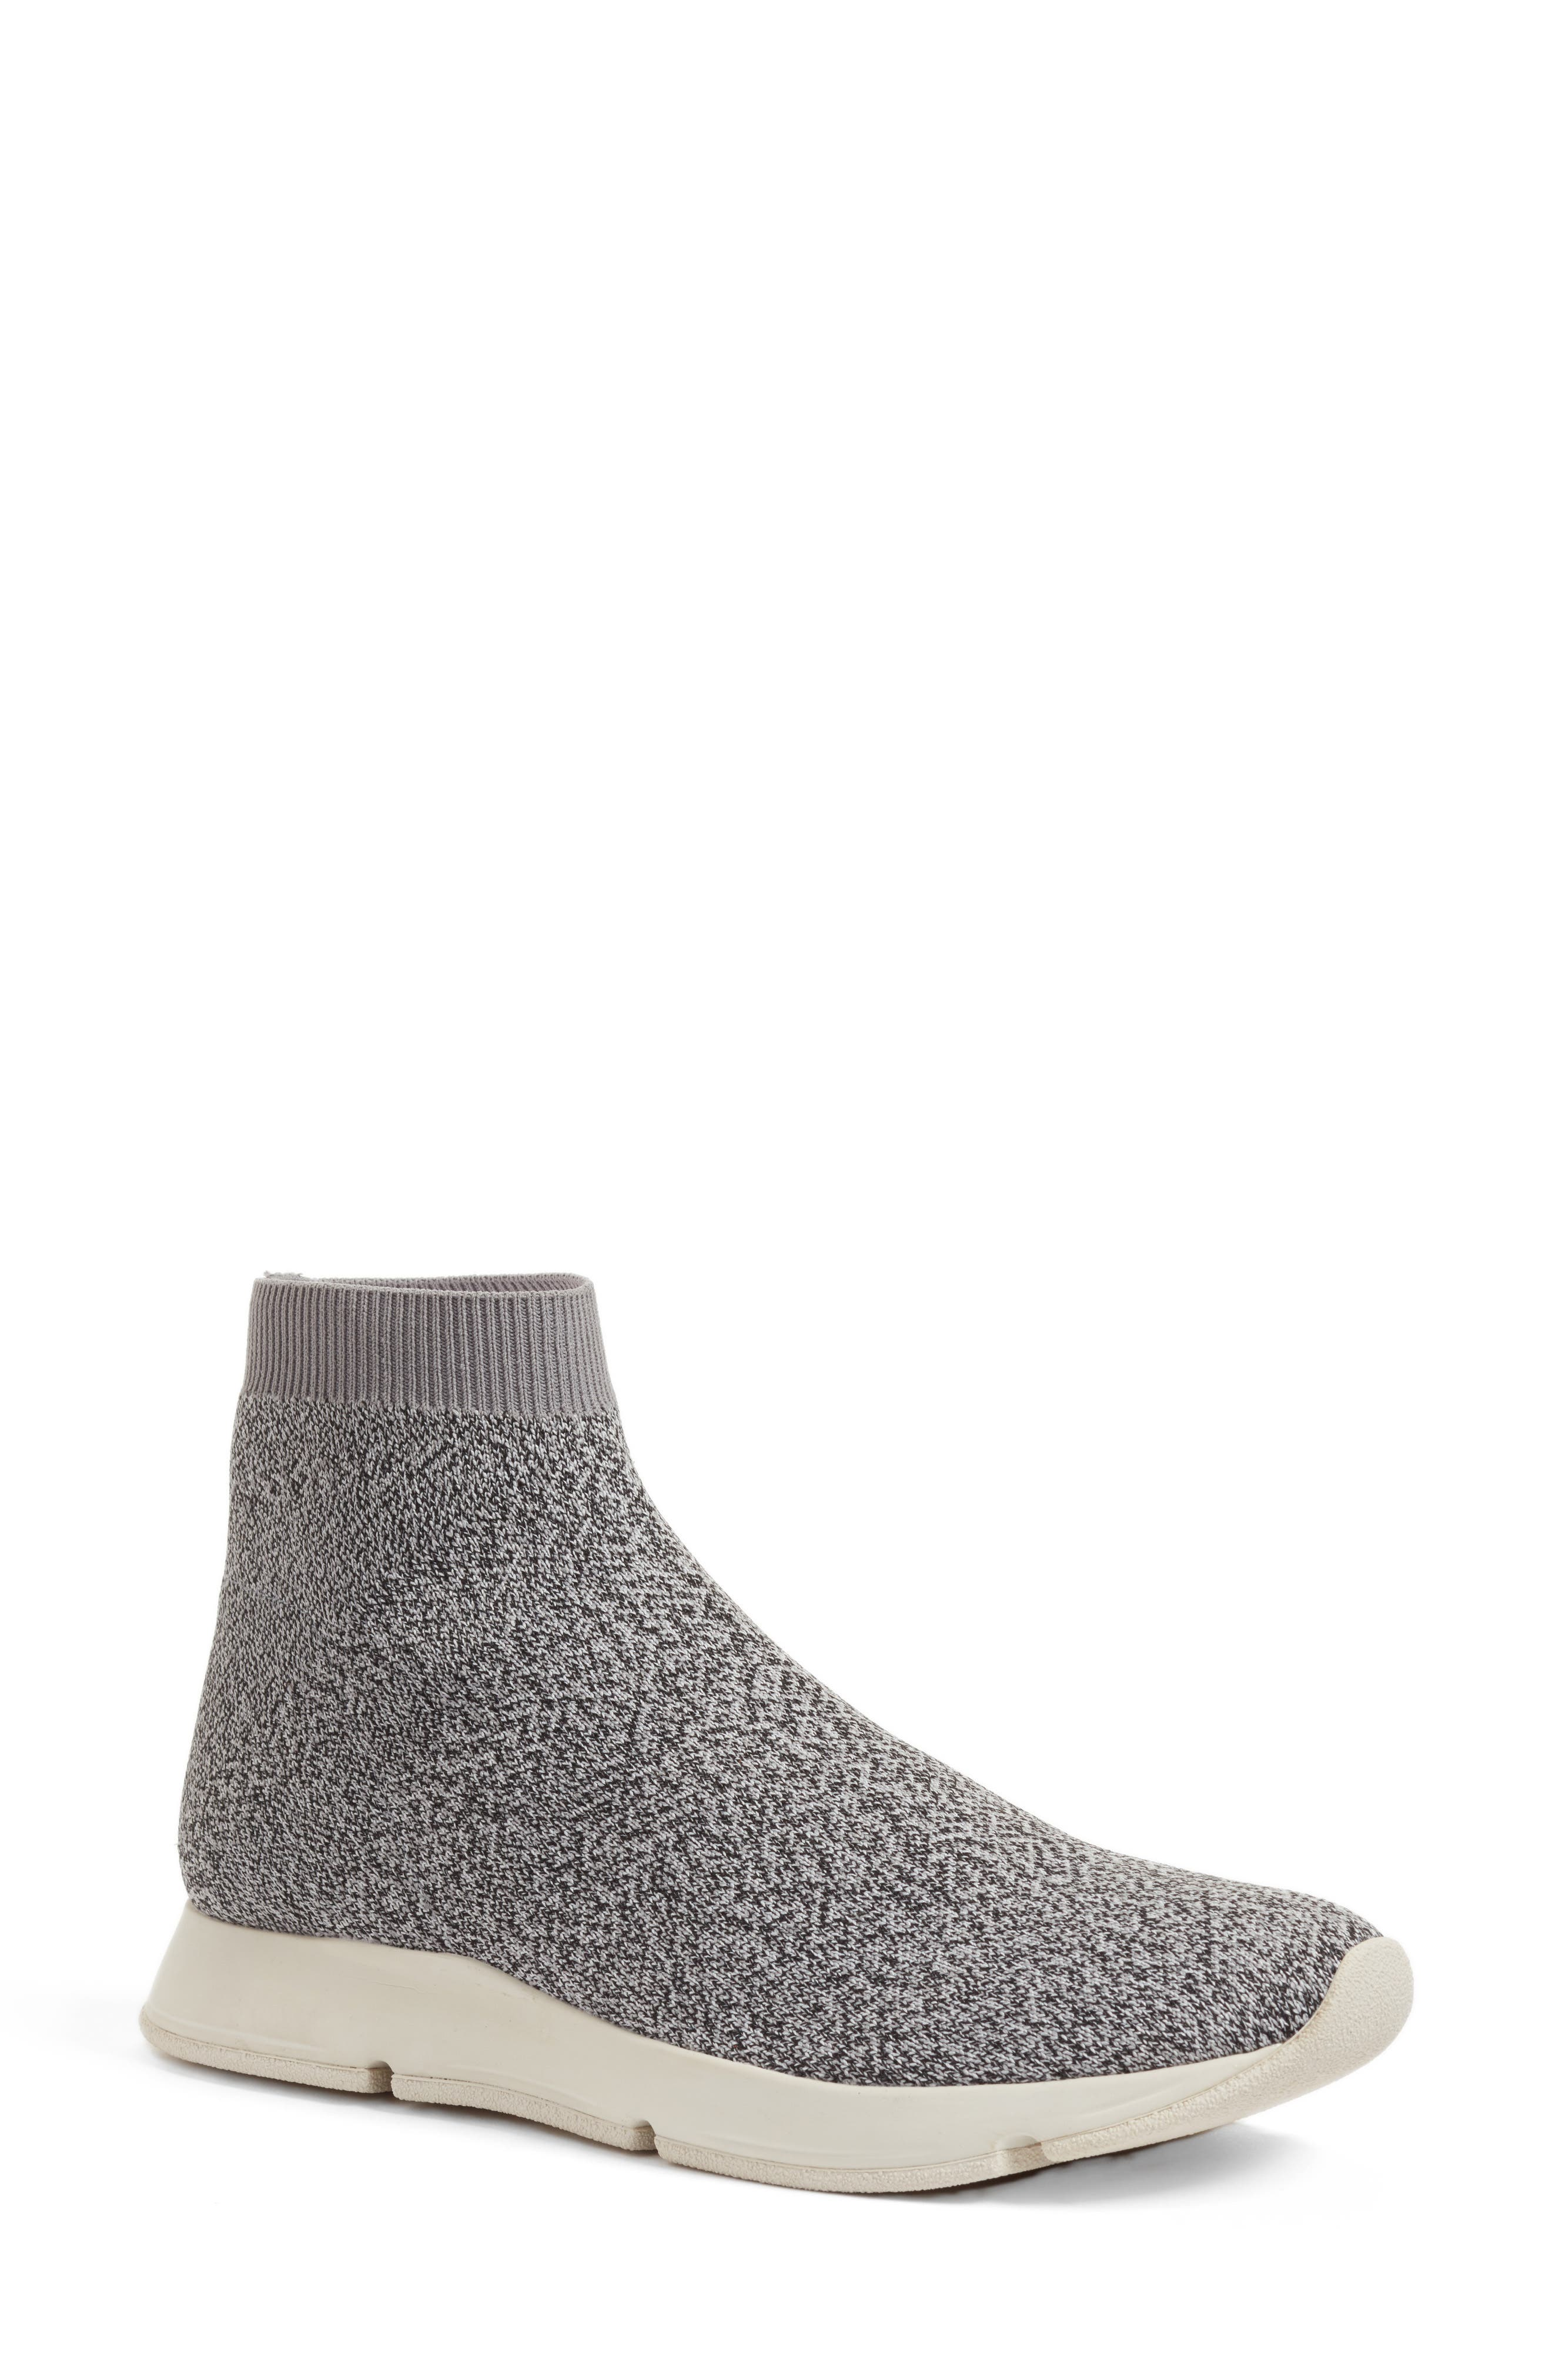 Tyra Sock Sneaker,                             Main thumbnail 1, color,                             Grey Marl